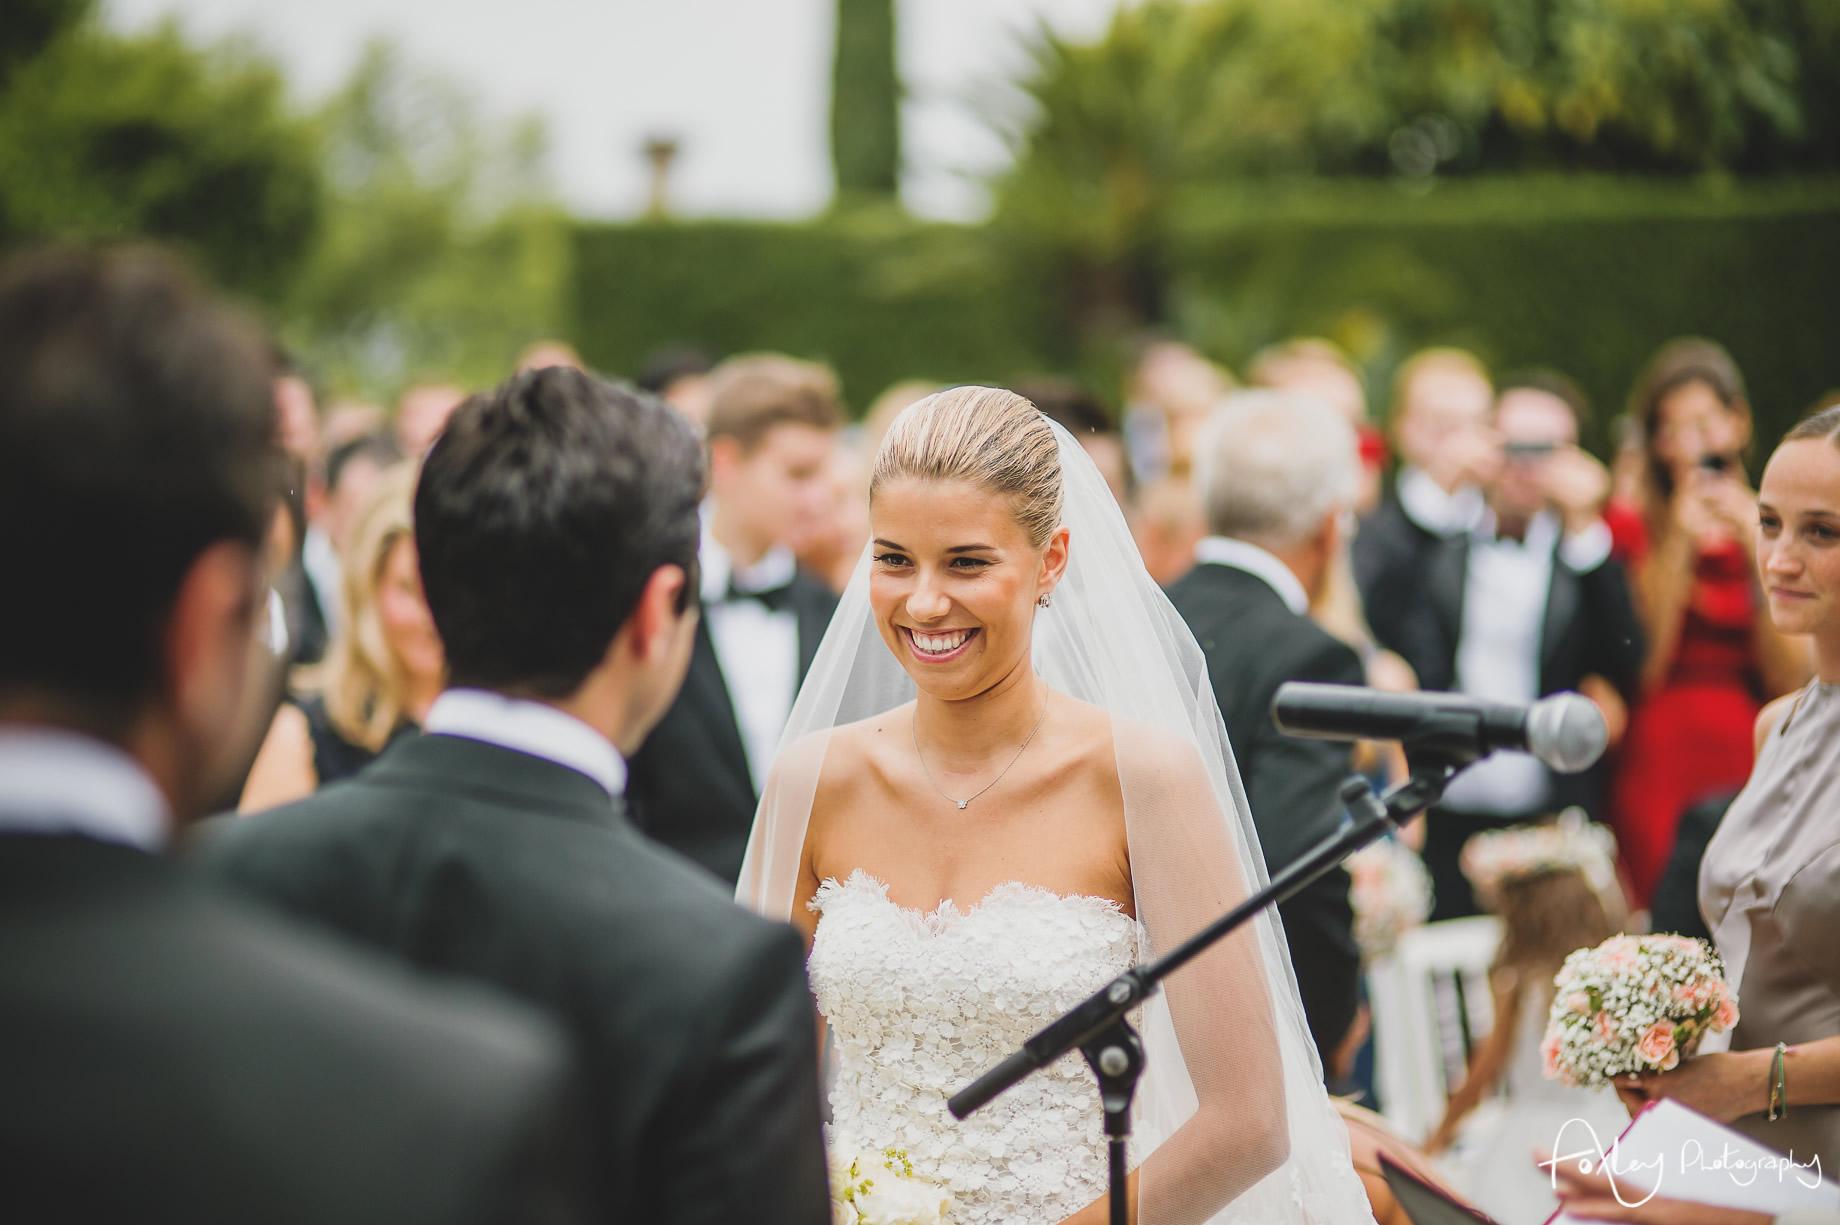 Jil and Will's Wedding at Villa Ephrussi De Rothschild 084